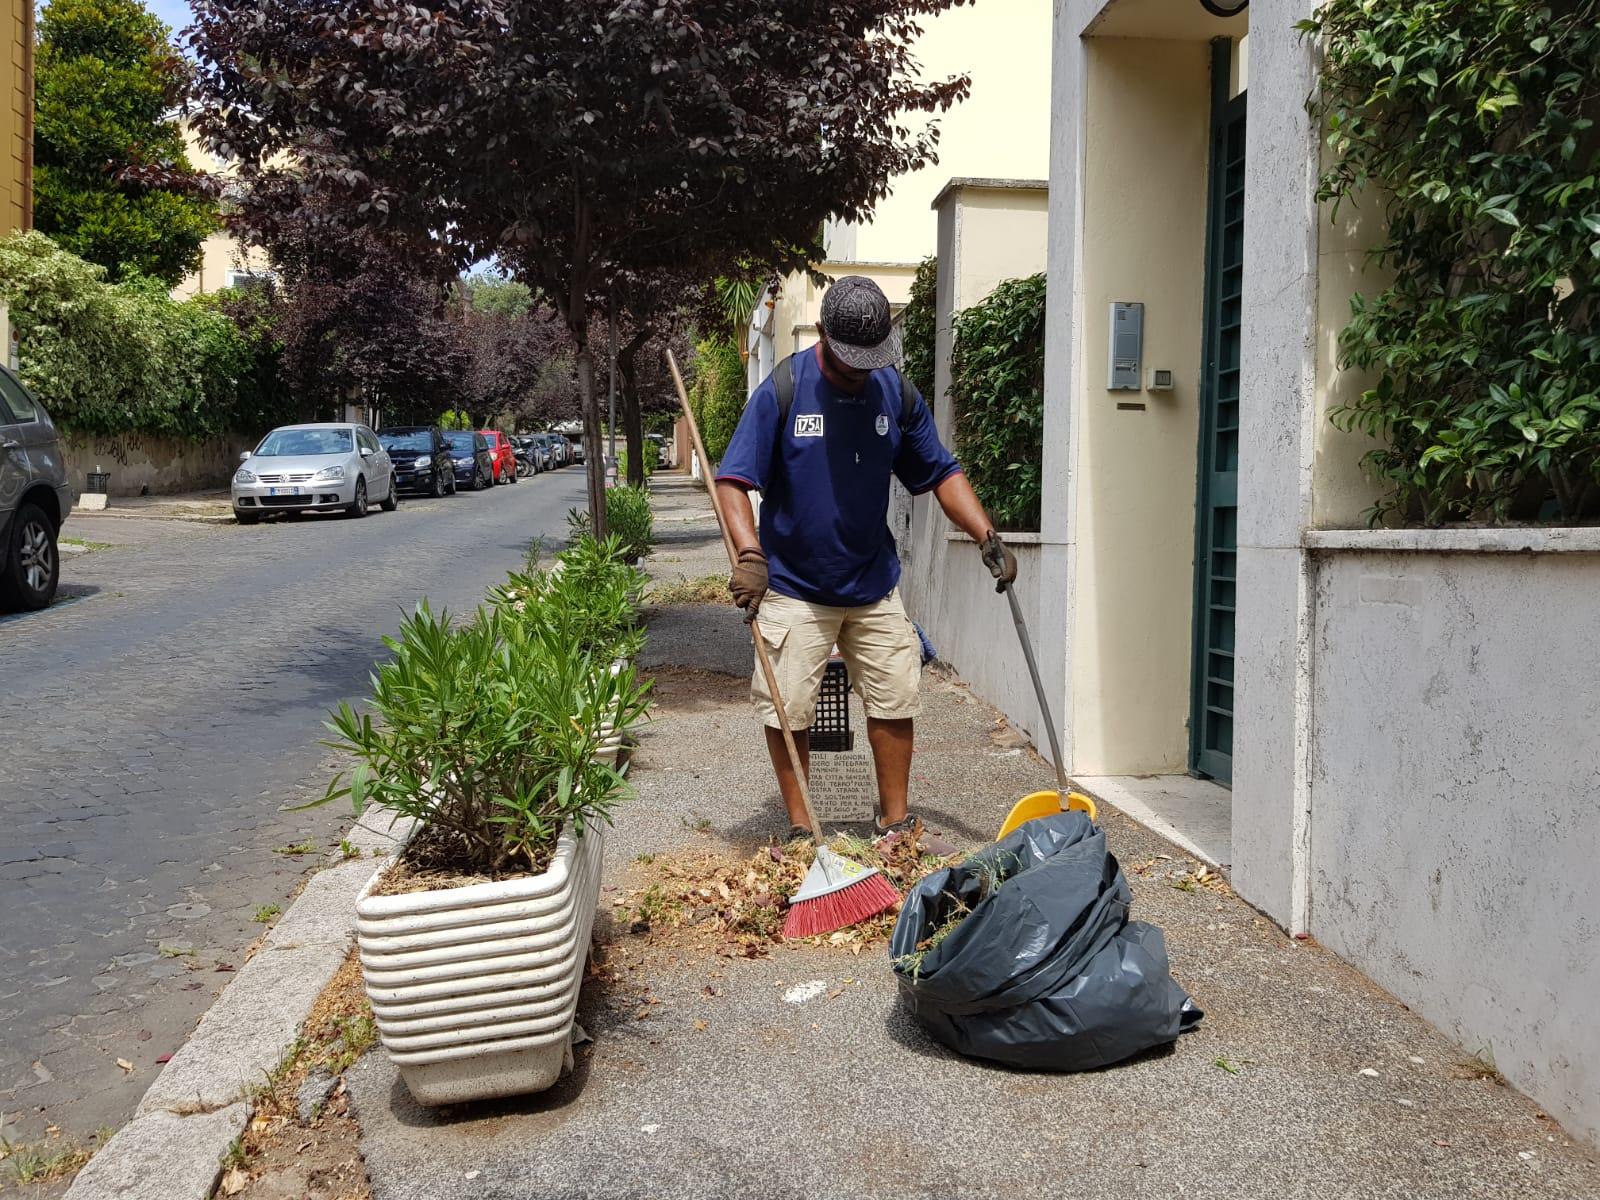 Denis al lavoro per tenere puliti i marciapiedi